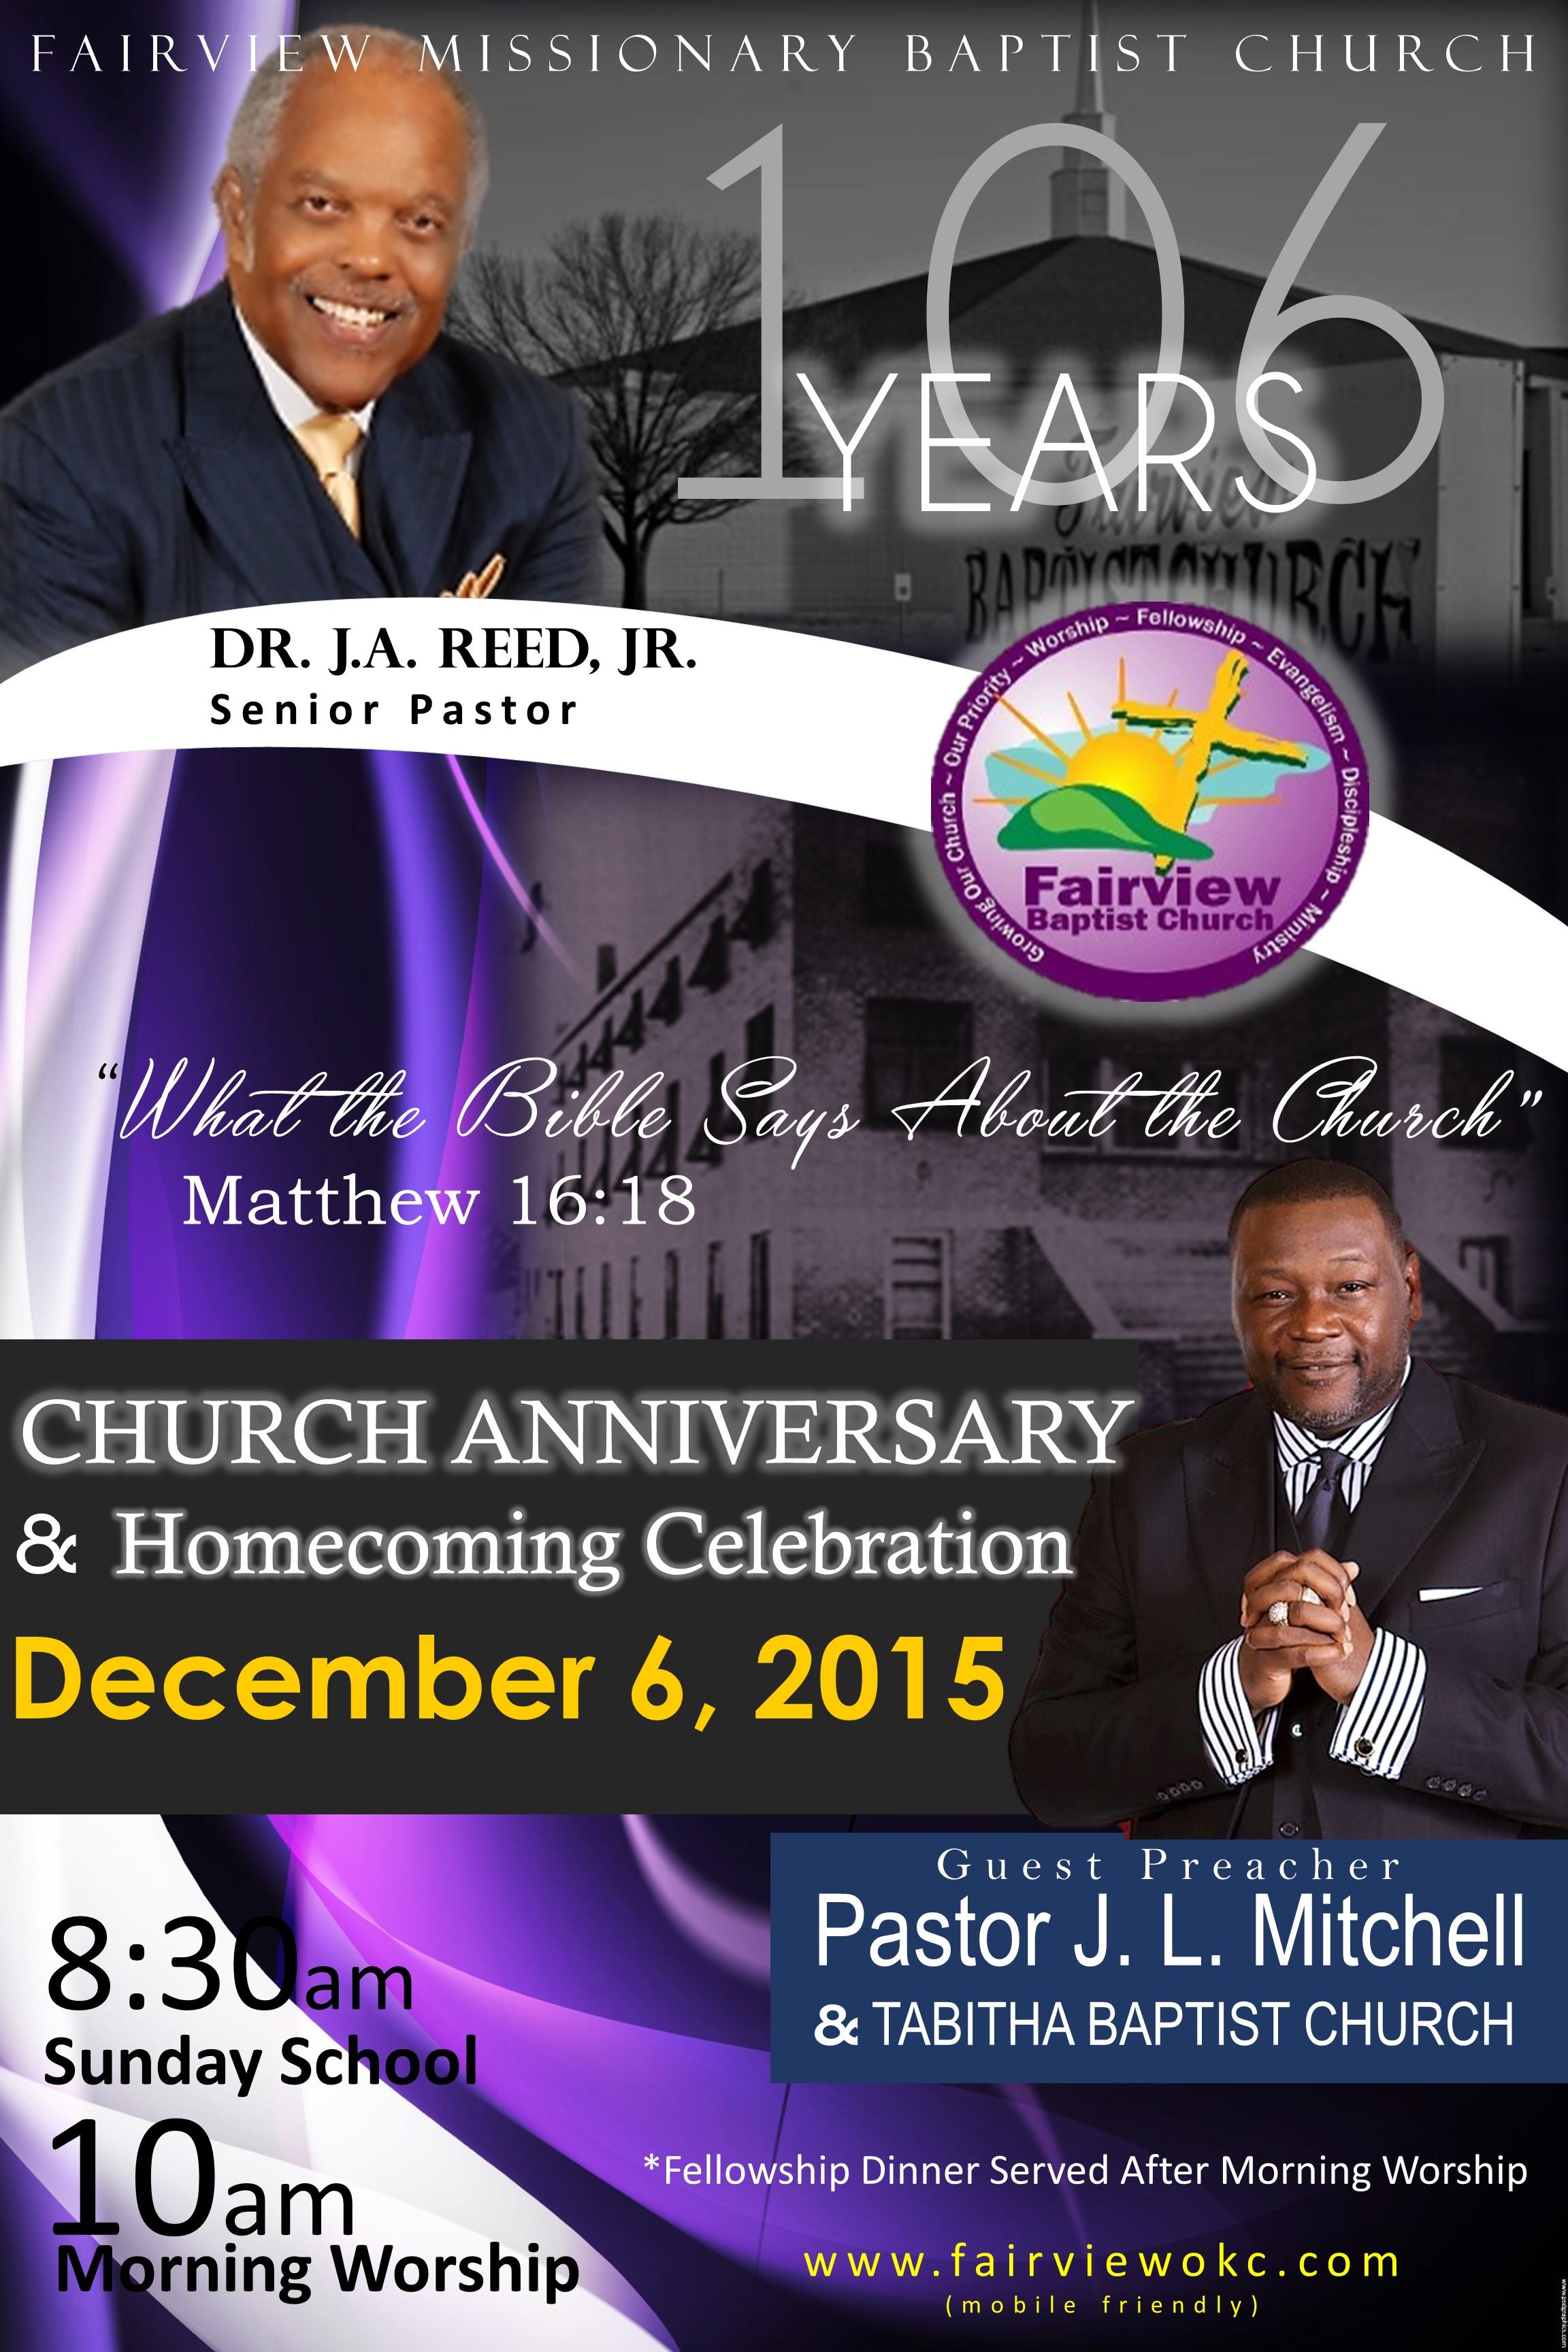 Fairview Missionary Baptist Church - 963.0KB